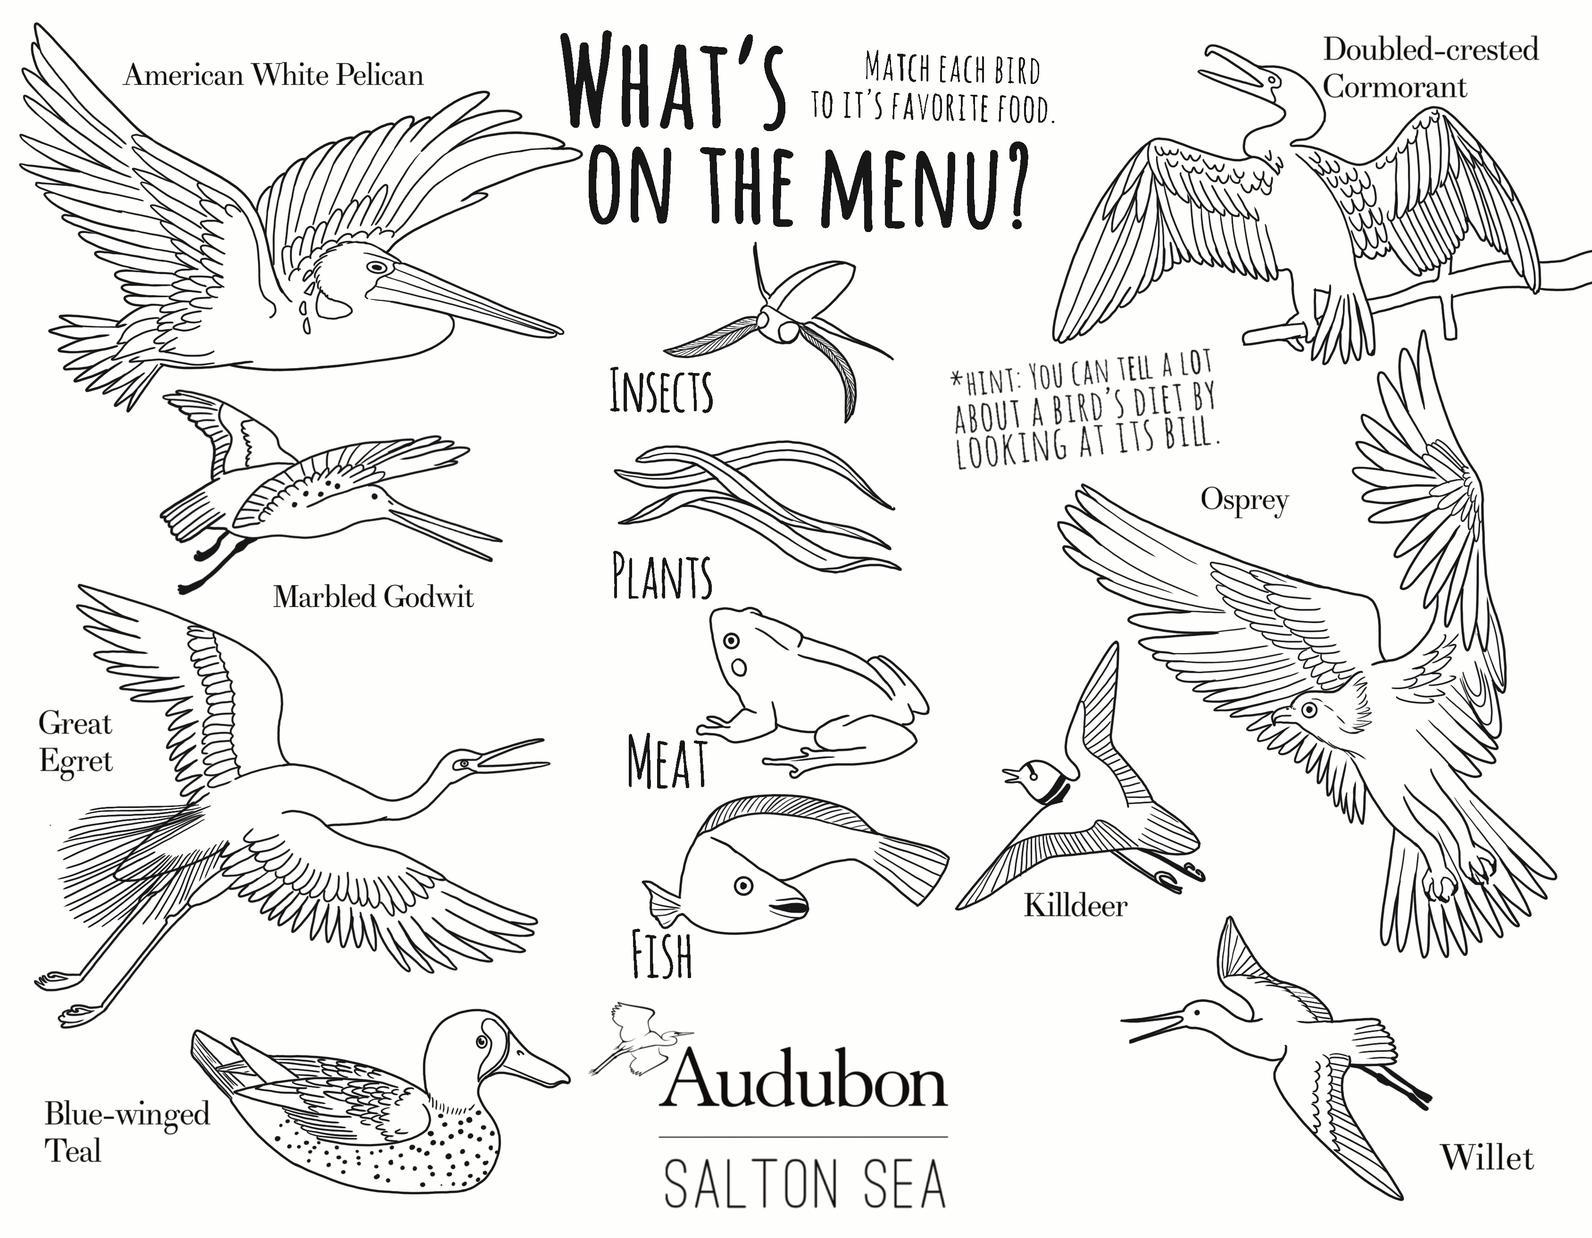 Whats-menu